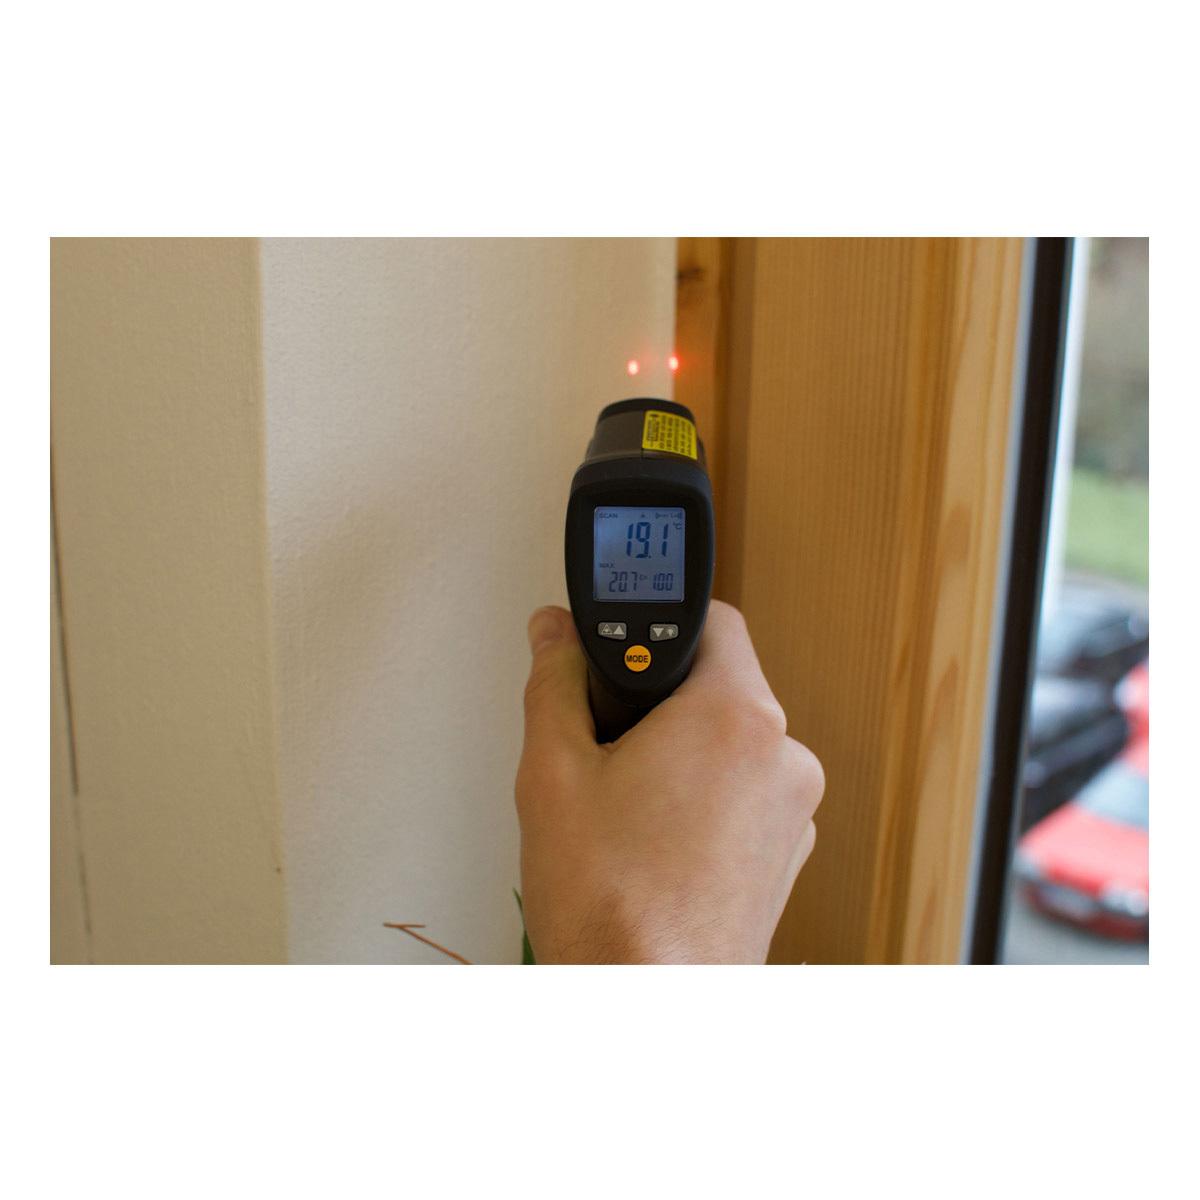 31-1124-infrarot-thermometer-scantemp-485-anwendung4-1200x1200px.jpg